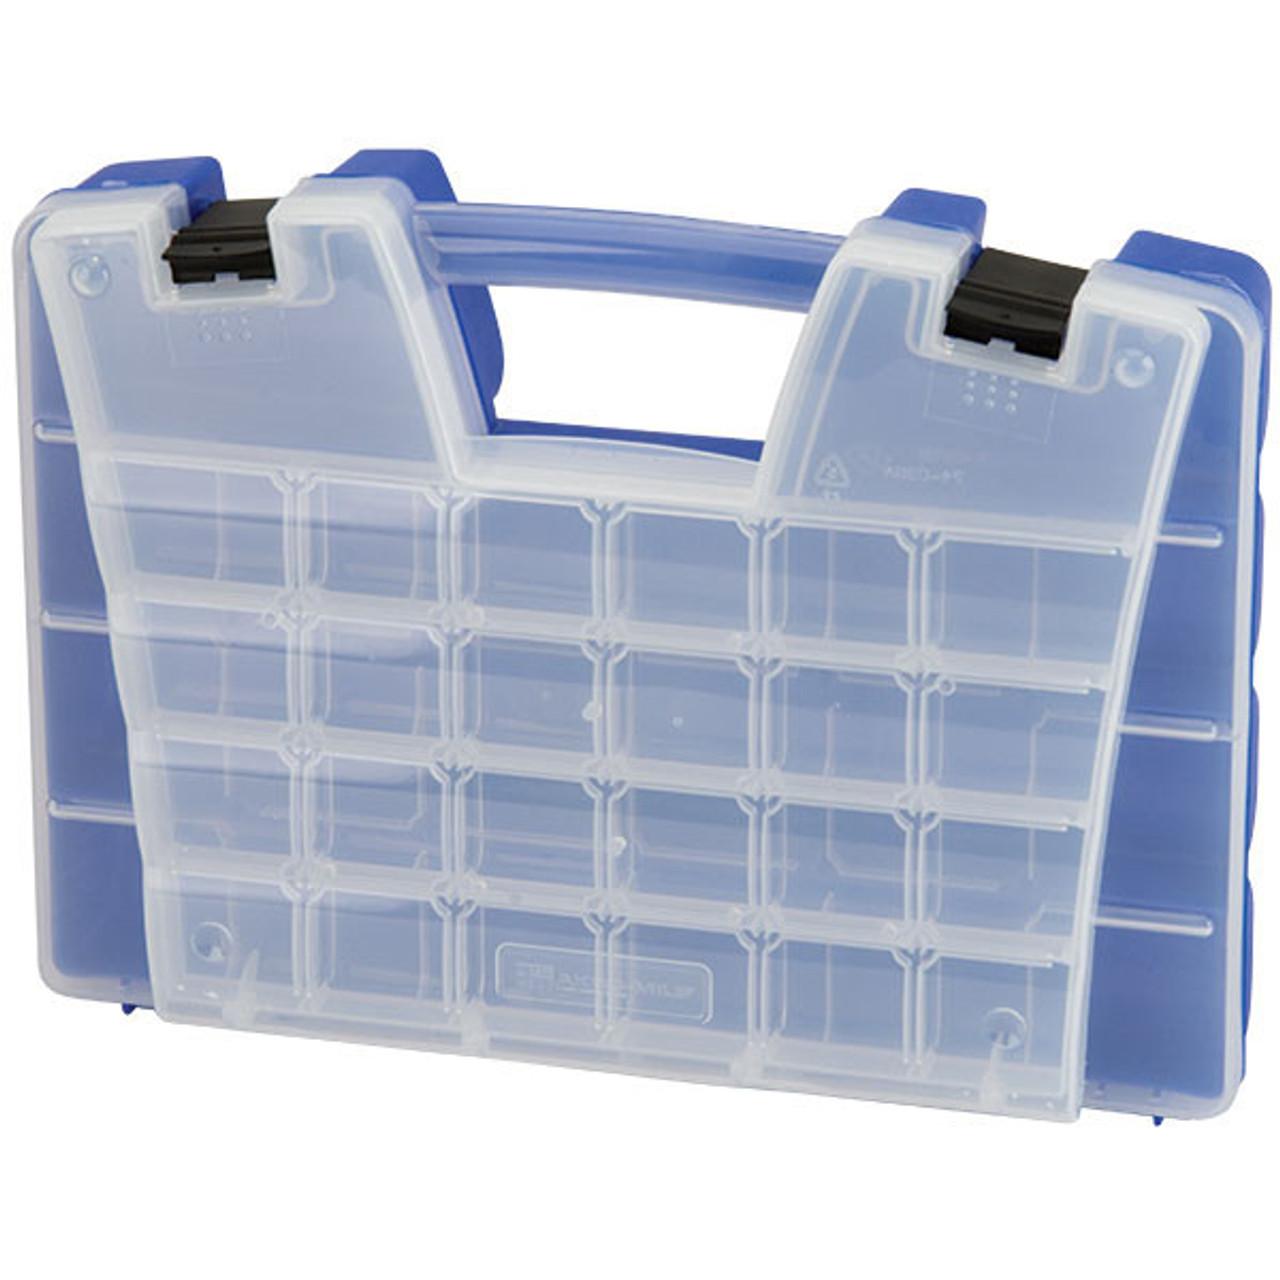 "Akro-Mils® Portable Storage Organizer 46 Compartments 15""L x 3 1/4""H x 11 5/6""W - 06115AM"